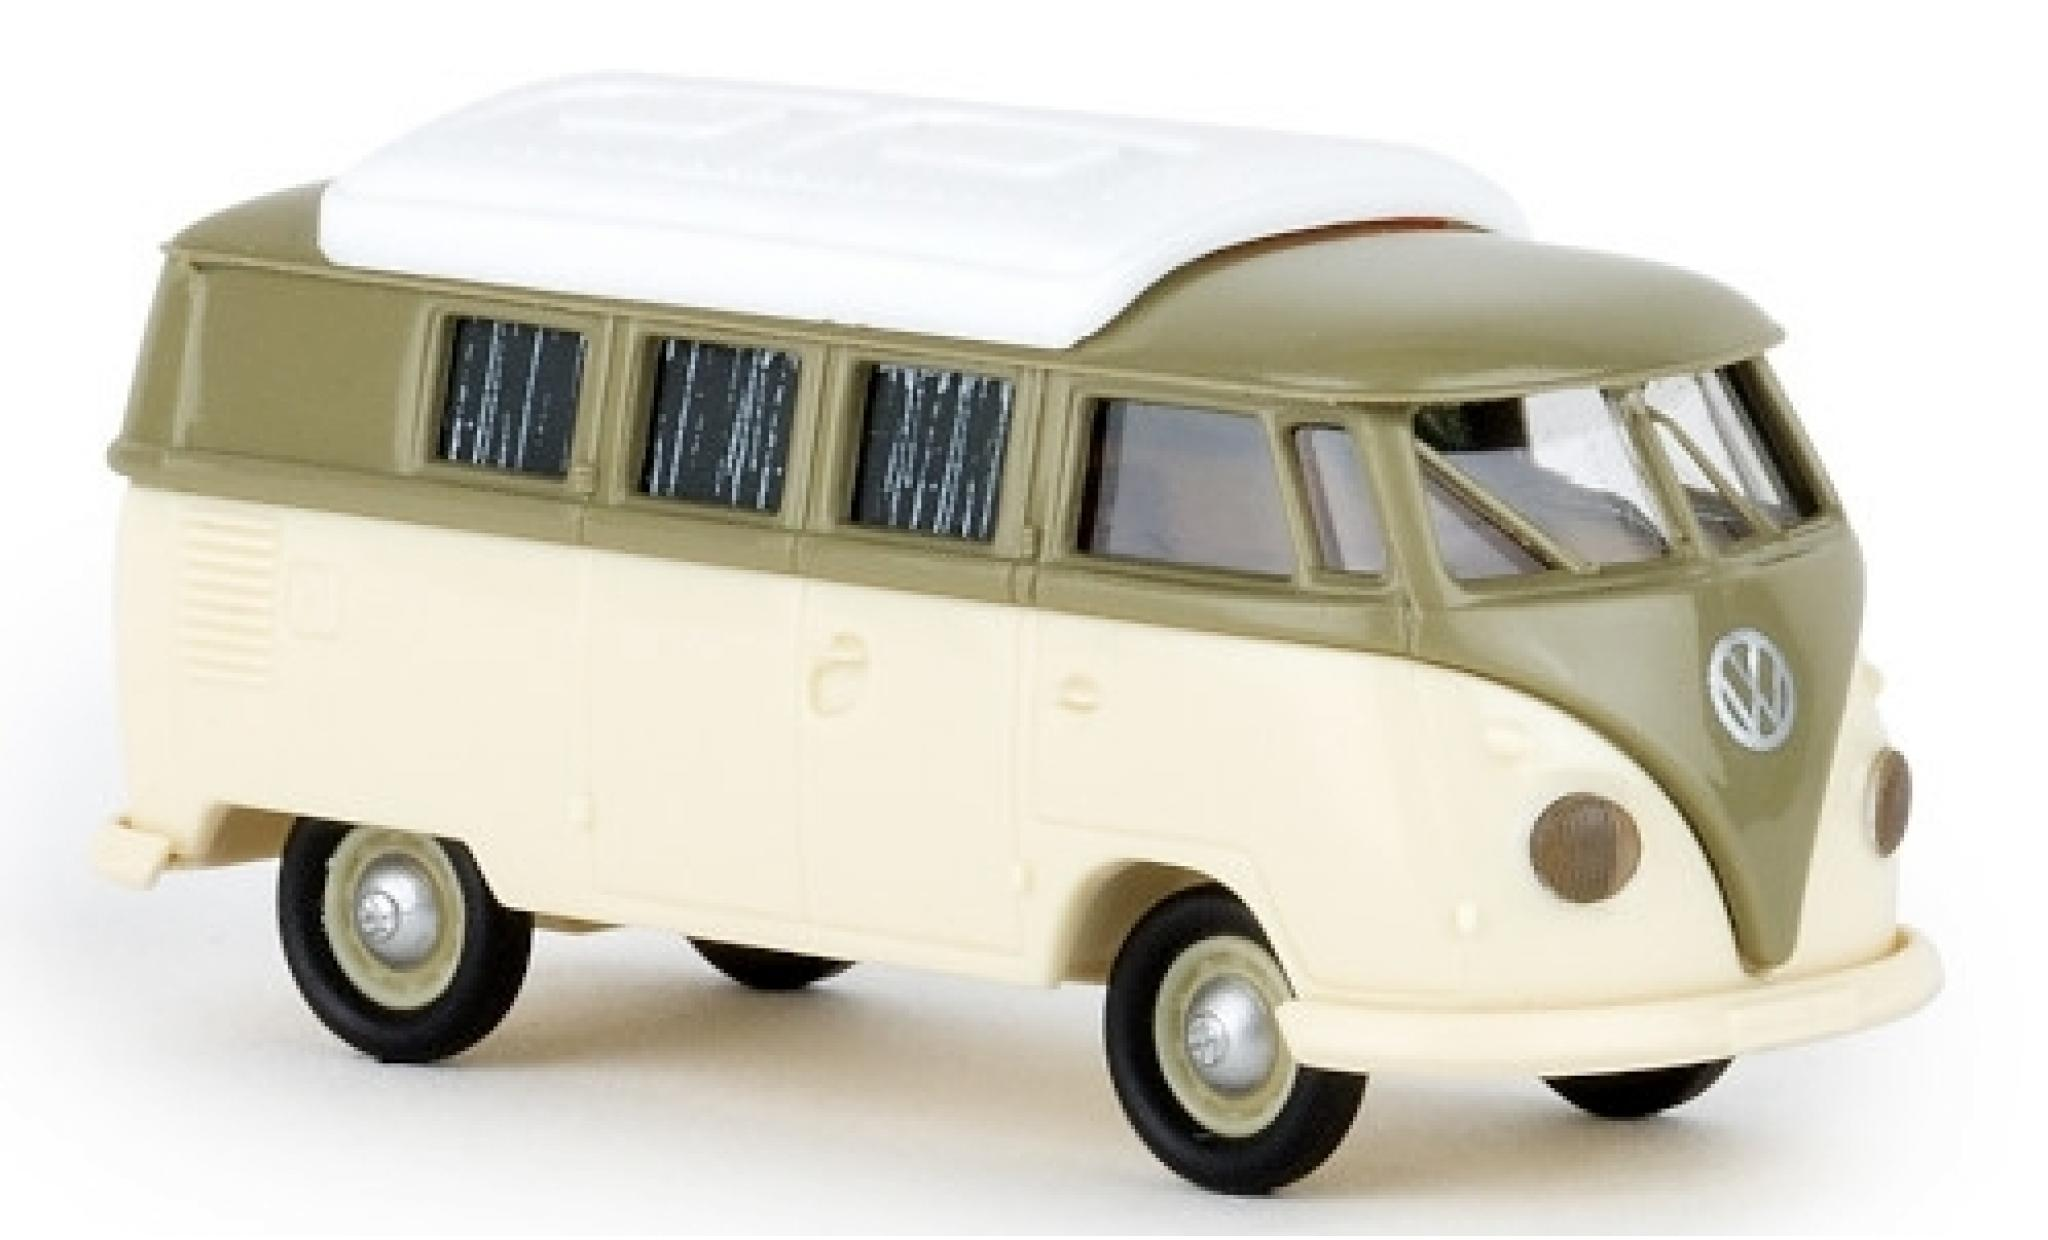 Volkswagen T1 1/87 Brekina b Camper grise/beige 1960 avec Dormobildach